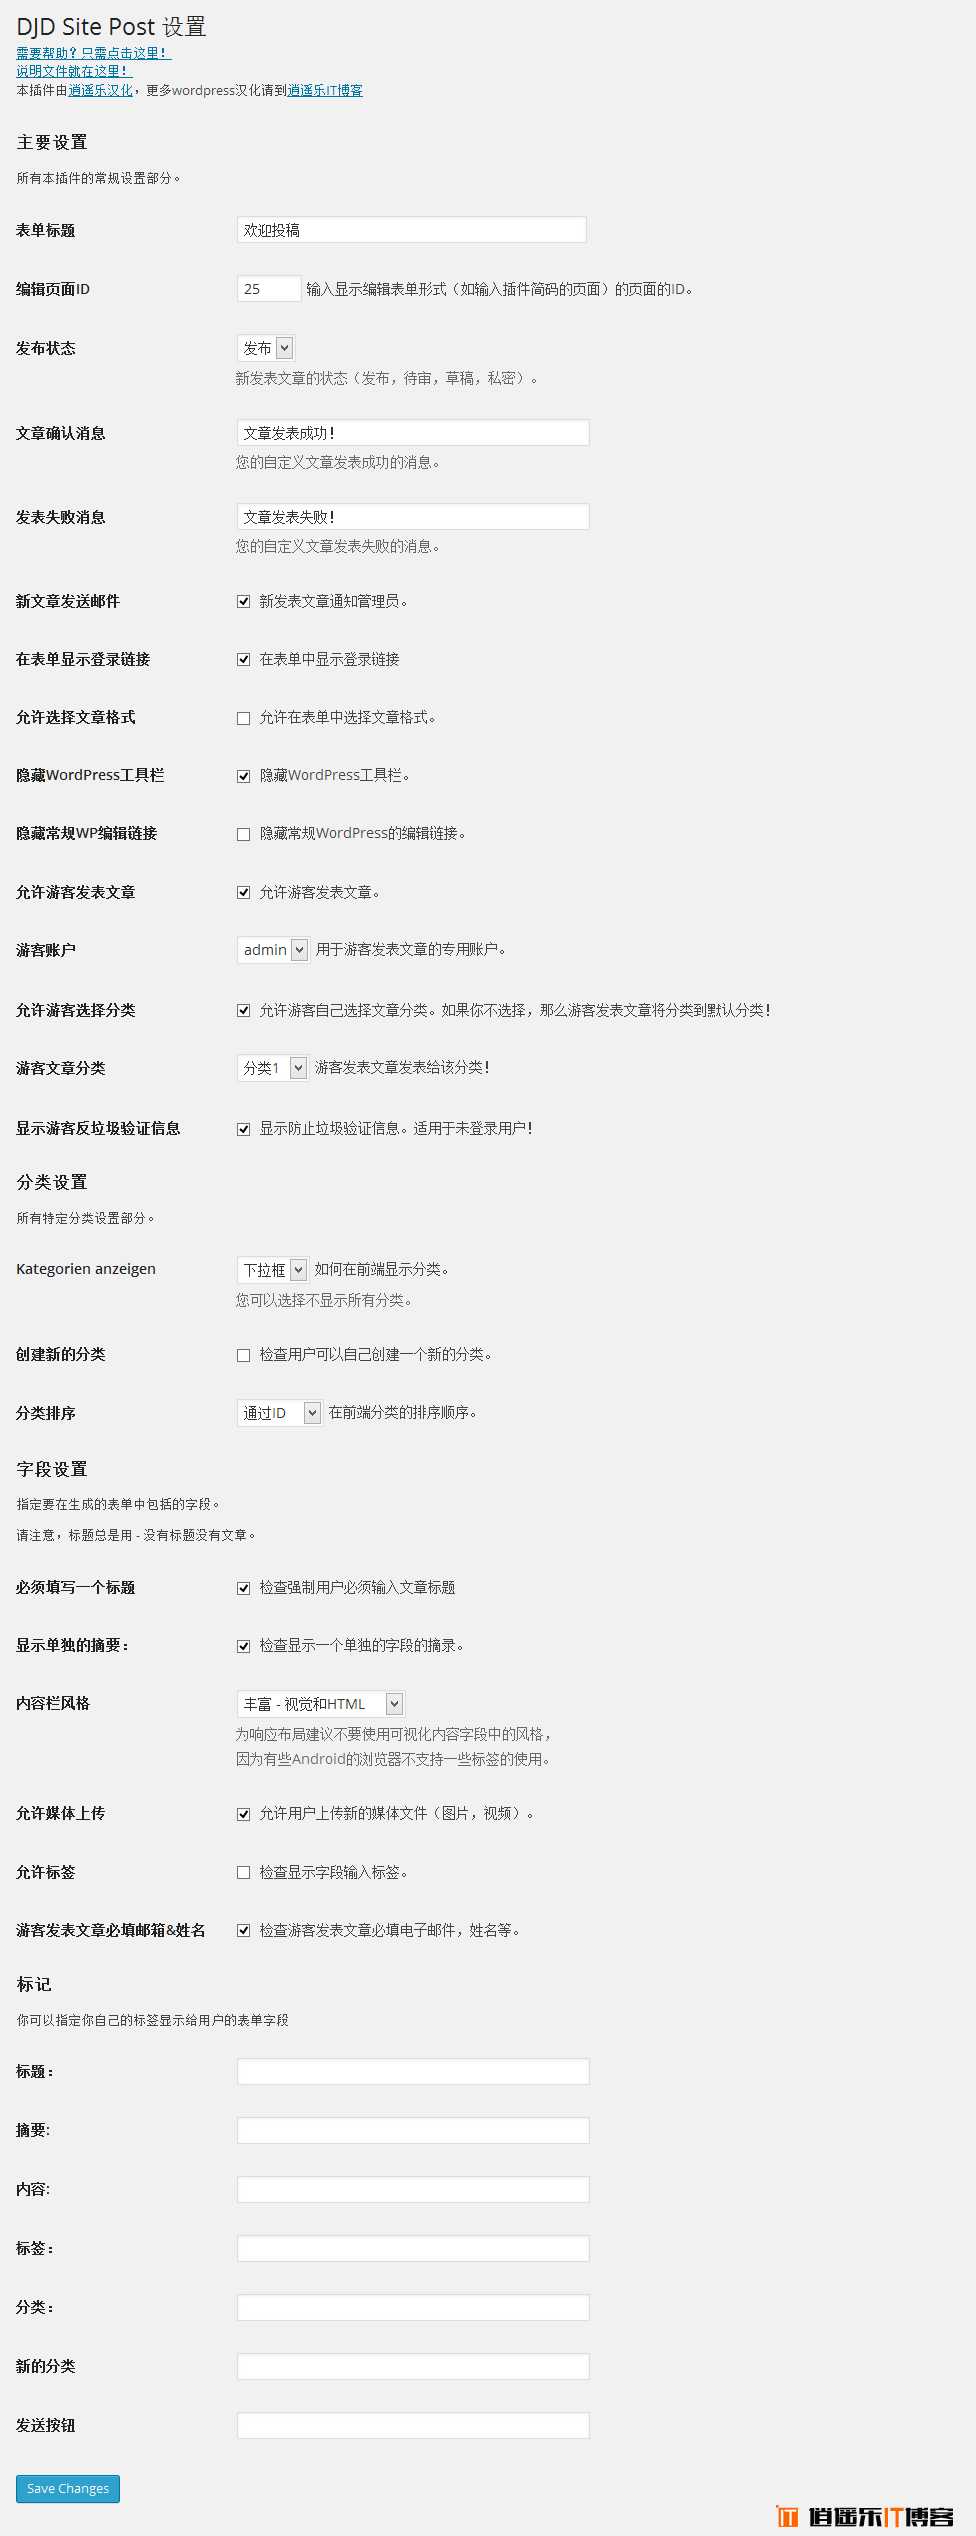 WordPress 前端投稿/编辑发表文章插件 DJD Site Post(支持游客和已注册用户)中文逍遥乐汉化版 免费下载